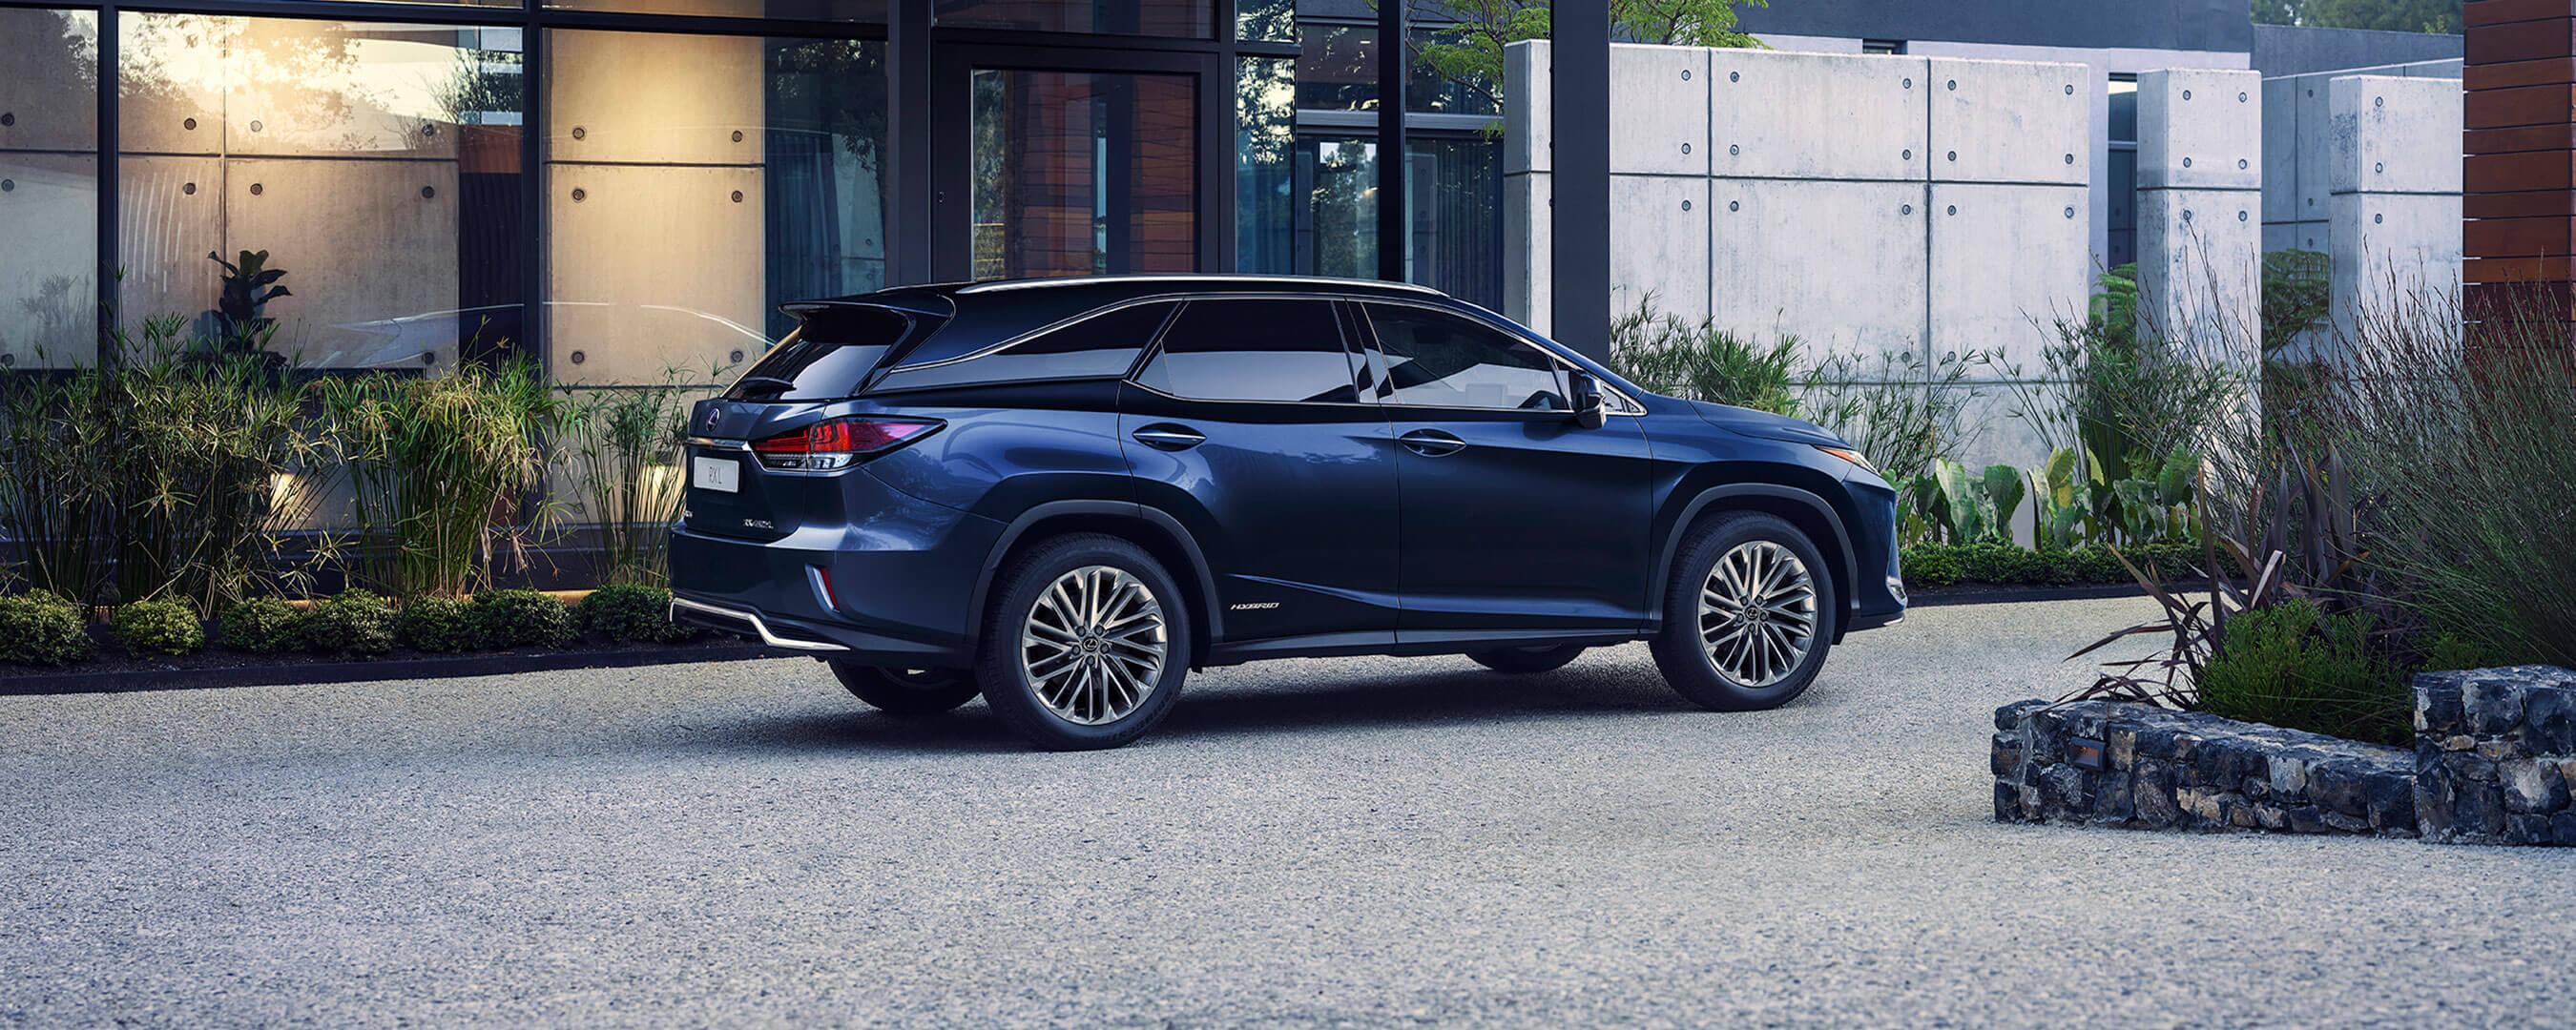 2021 lexus rx l experience hero exterior rear